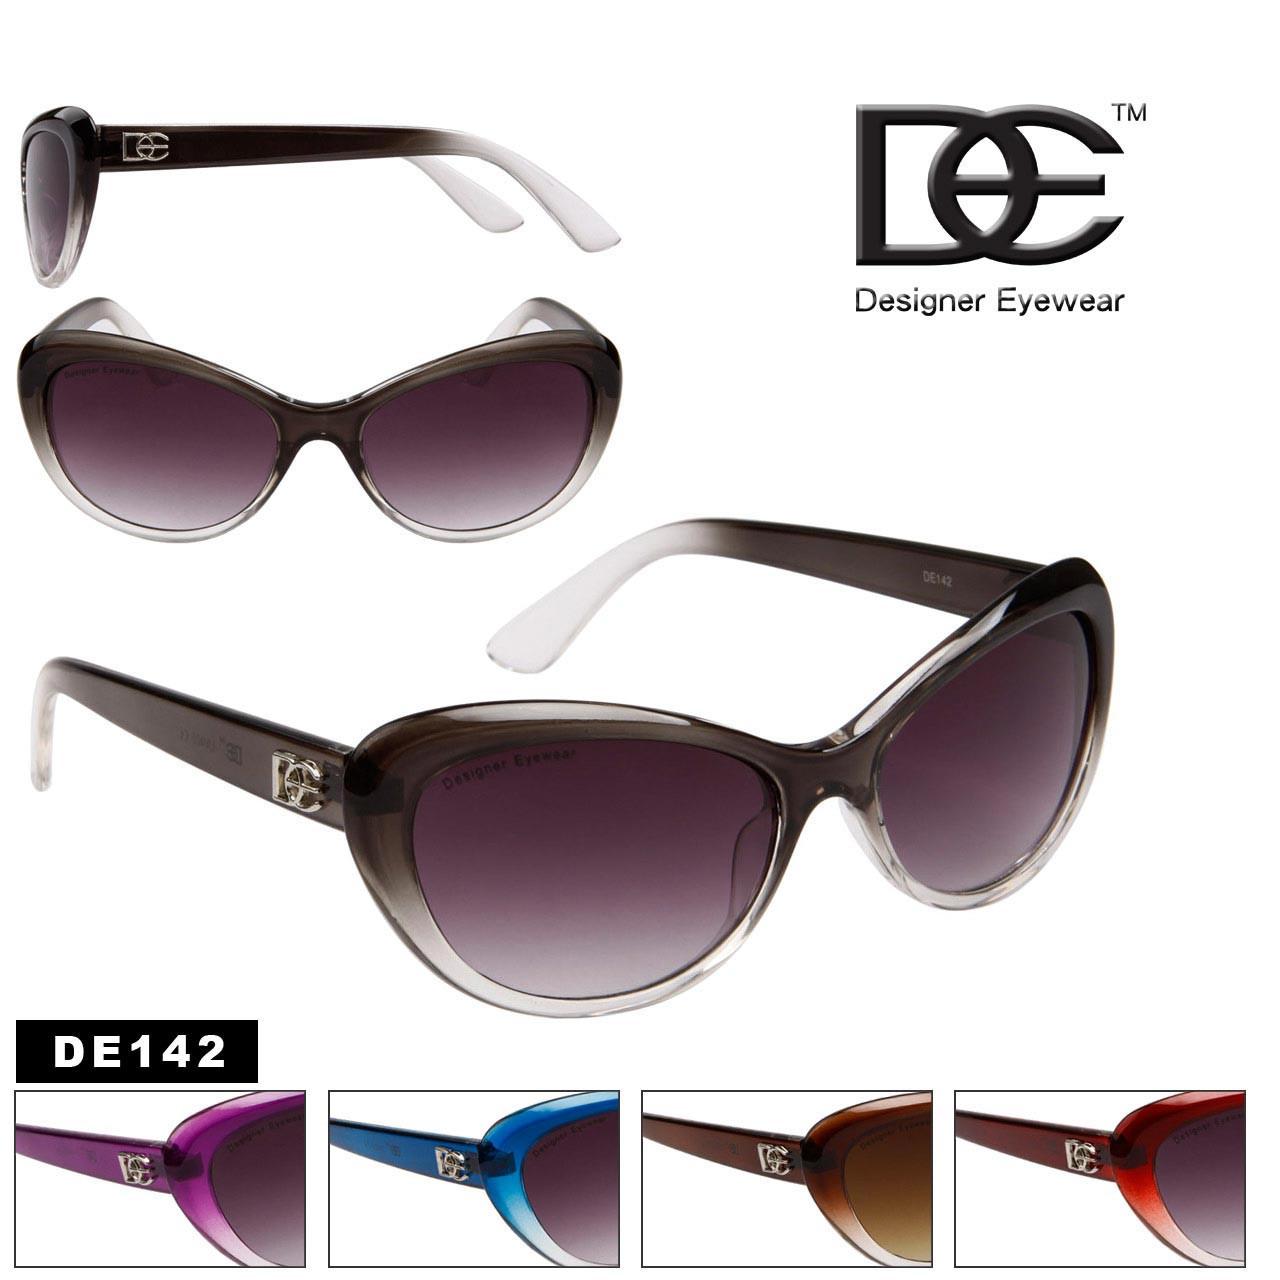 DE™ Cat Eye Sunglasses DE142